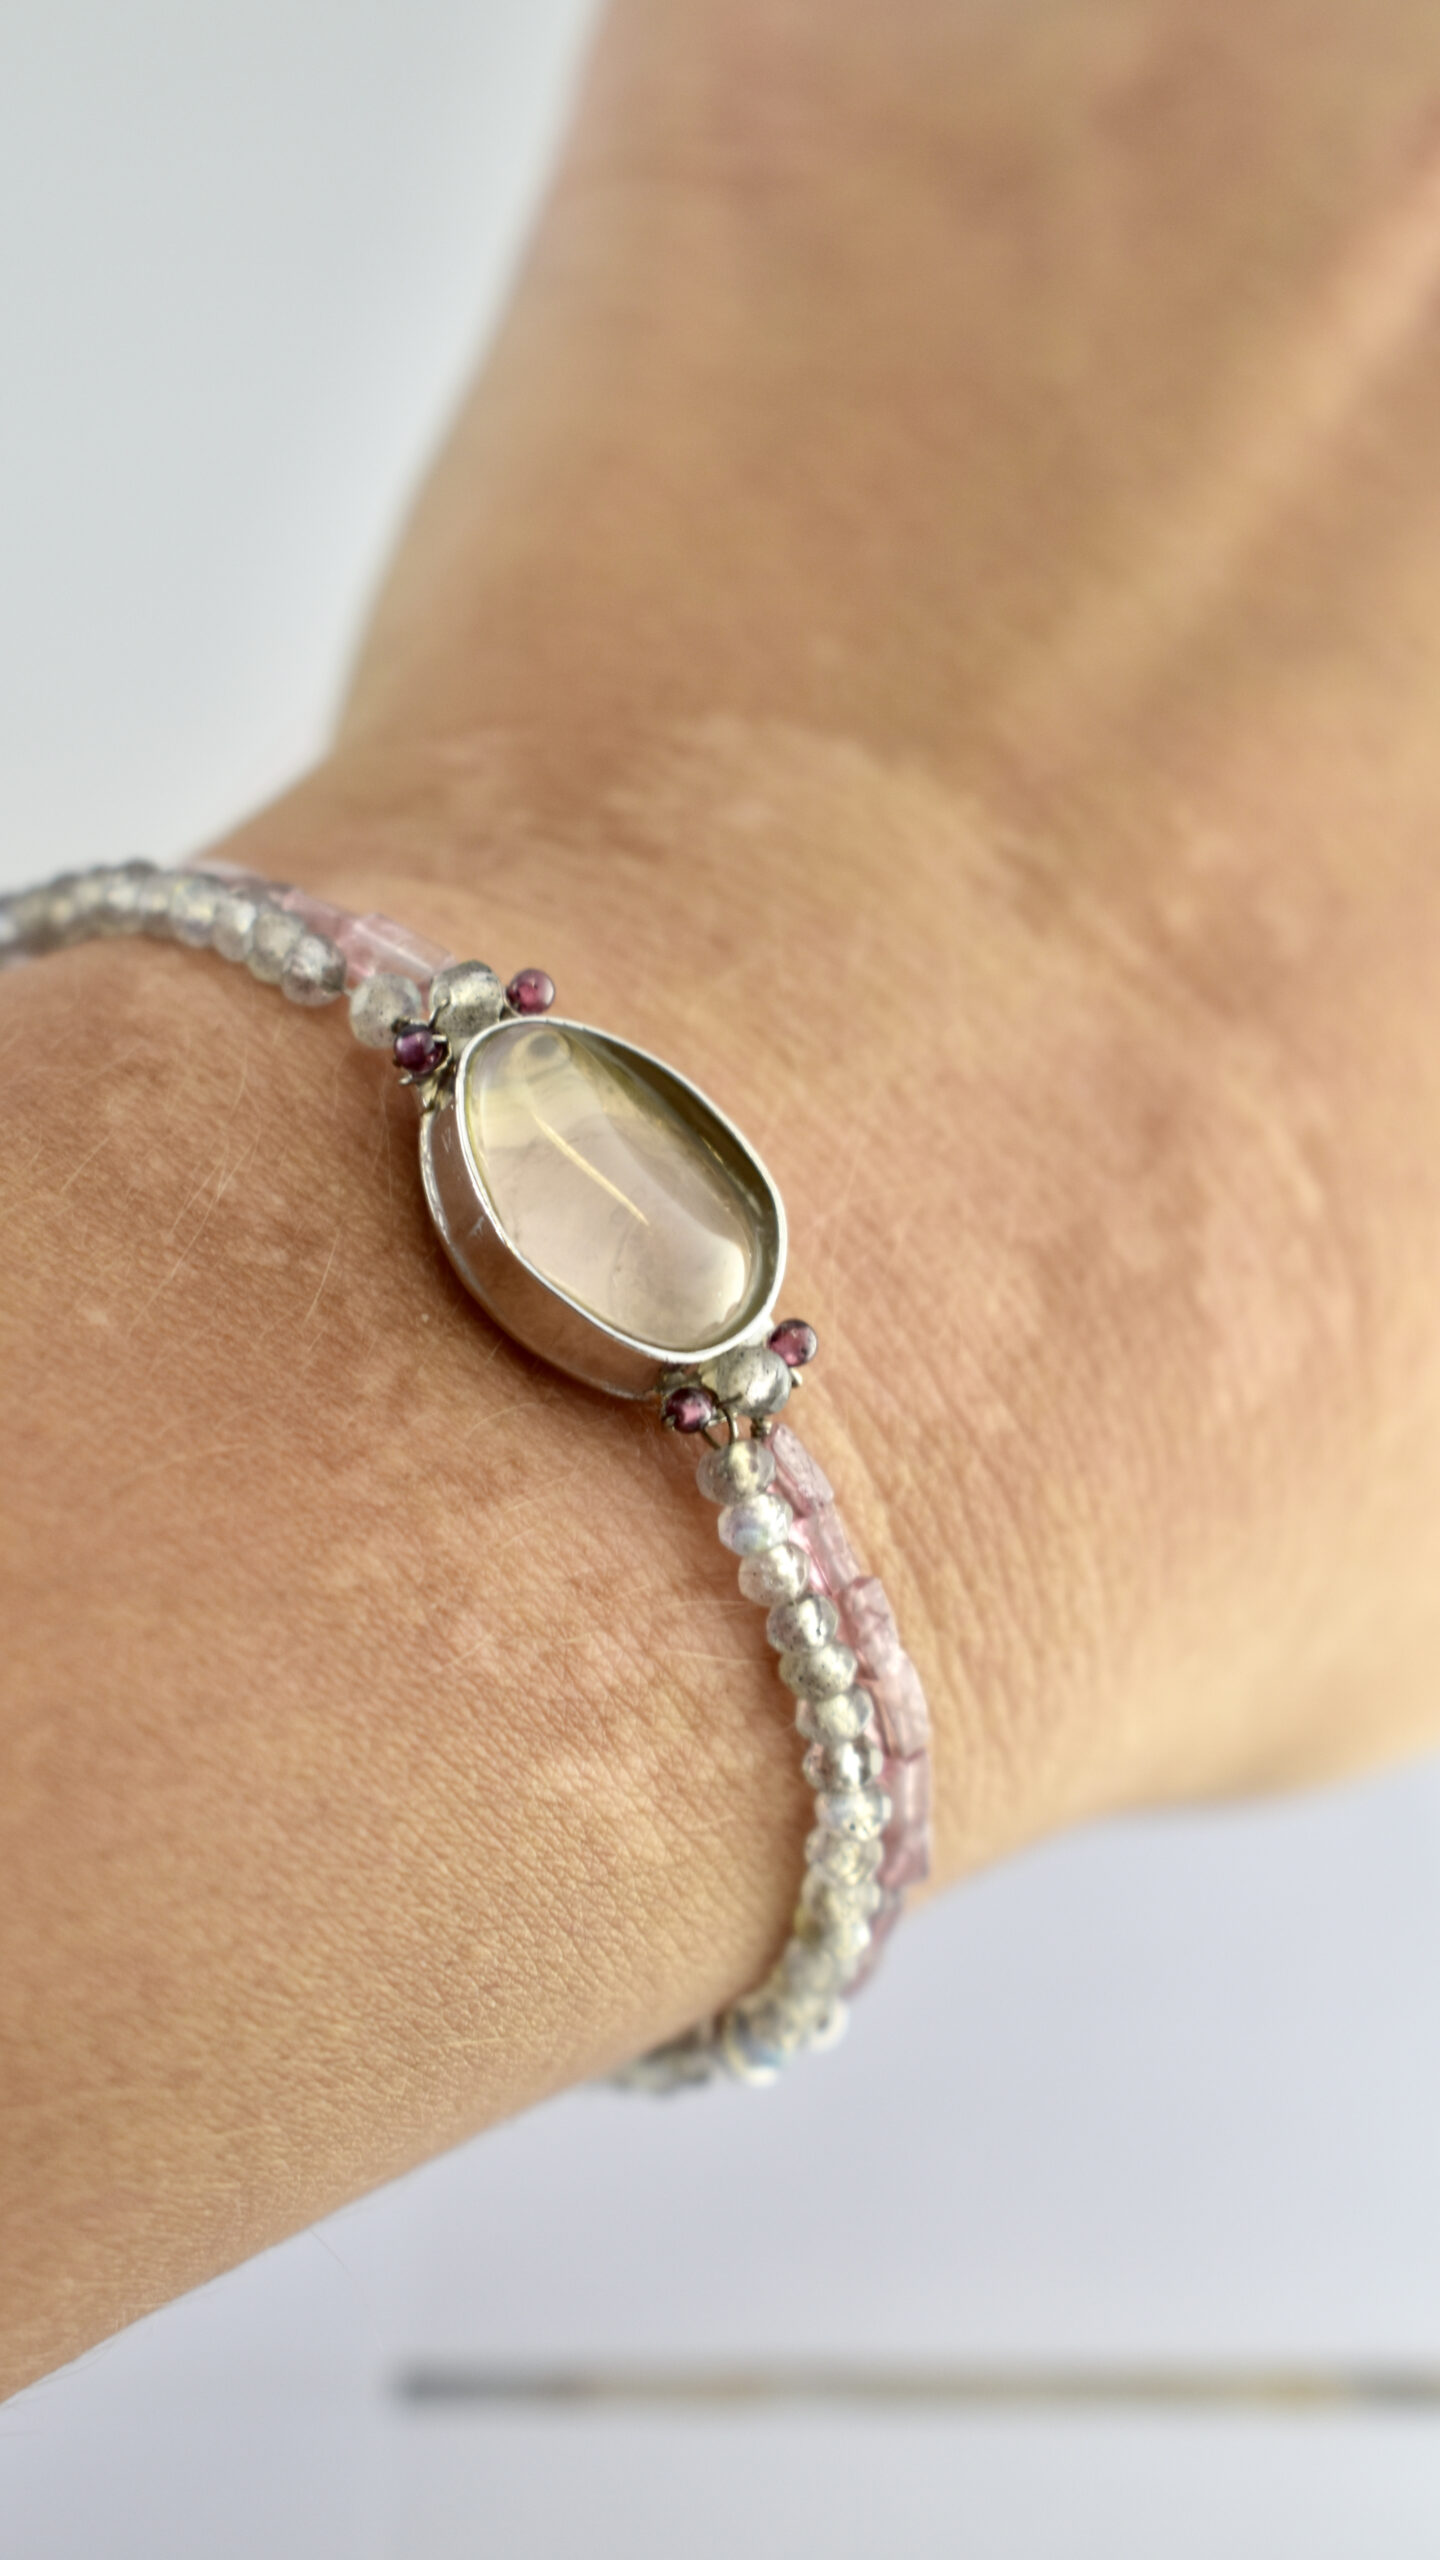 Nico Taeymans armband labrodoriet en hessoniet